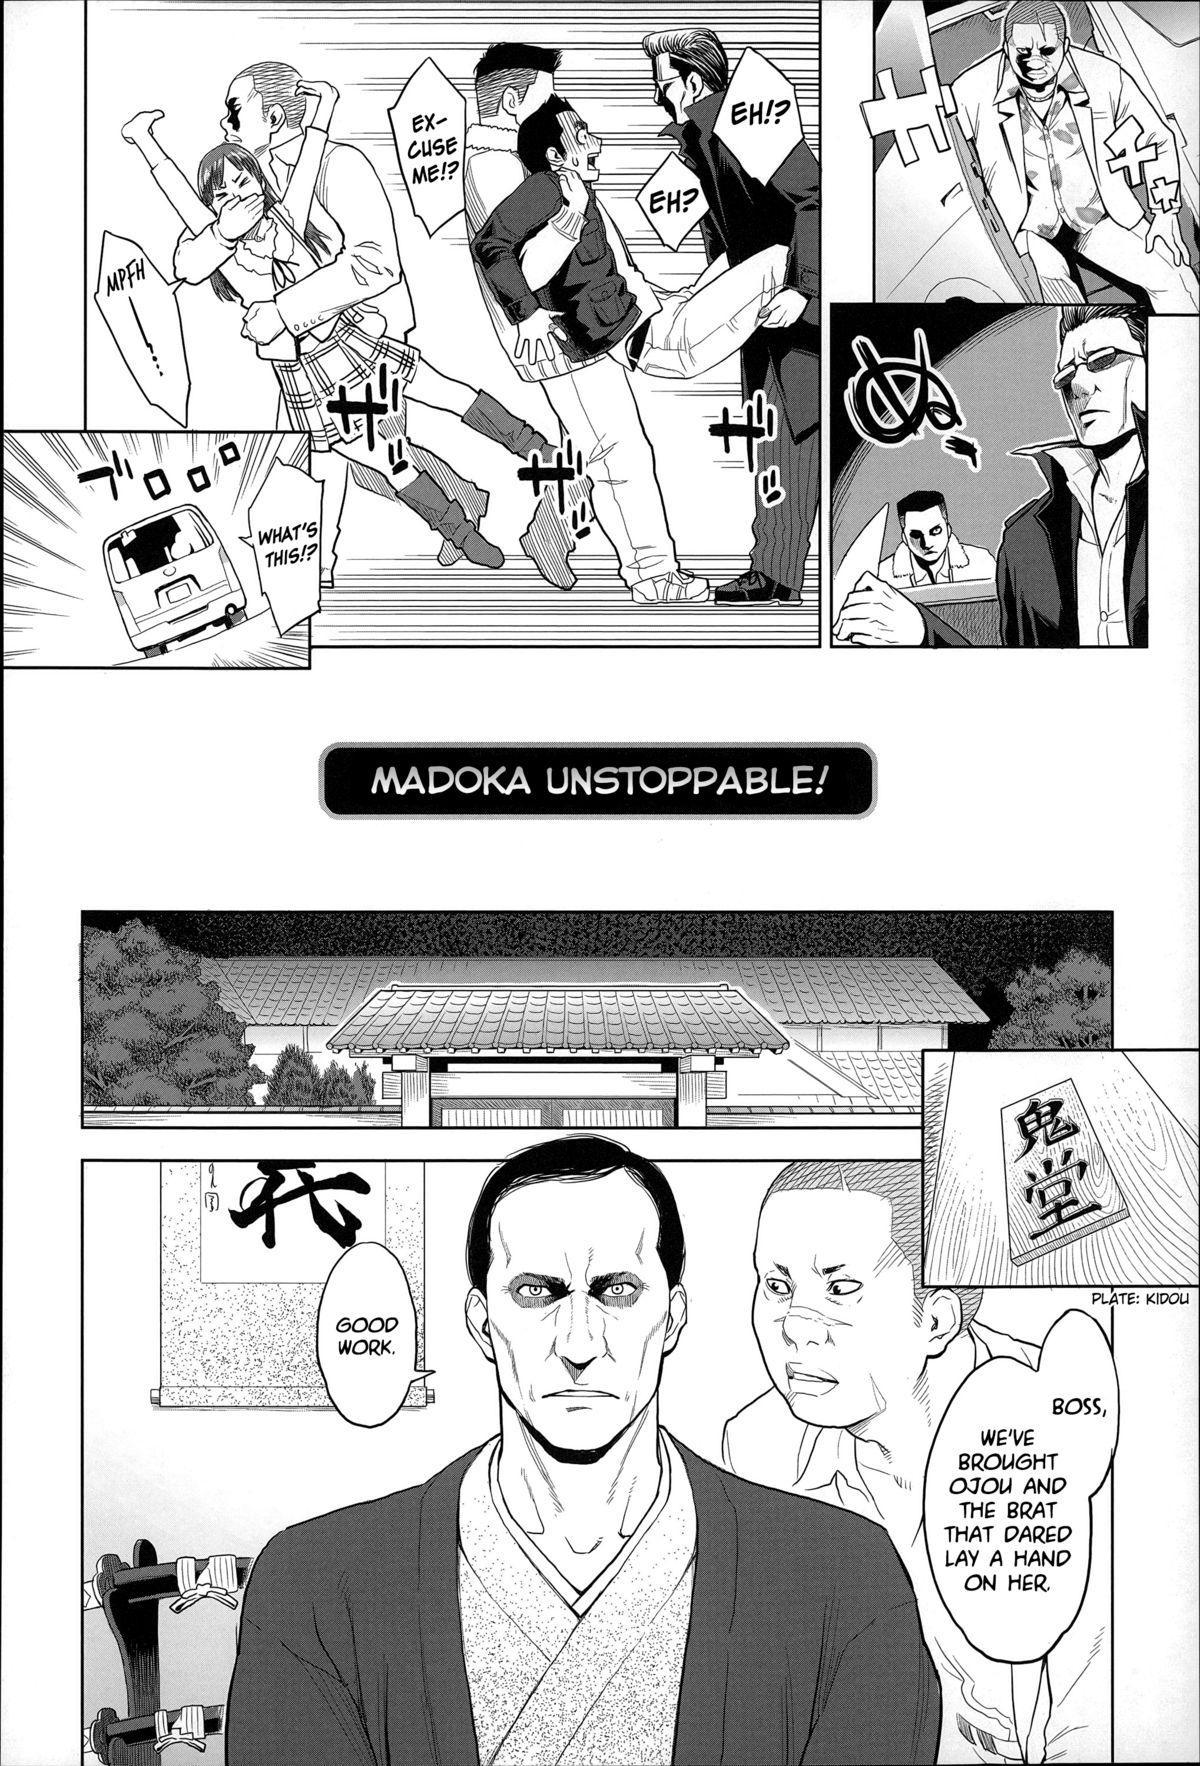 Madoka Unstoppable! 1